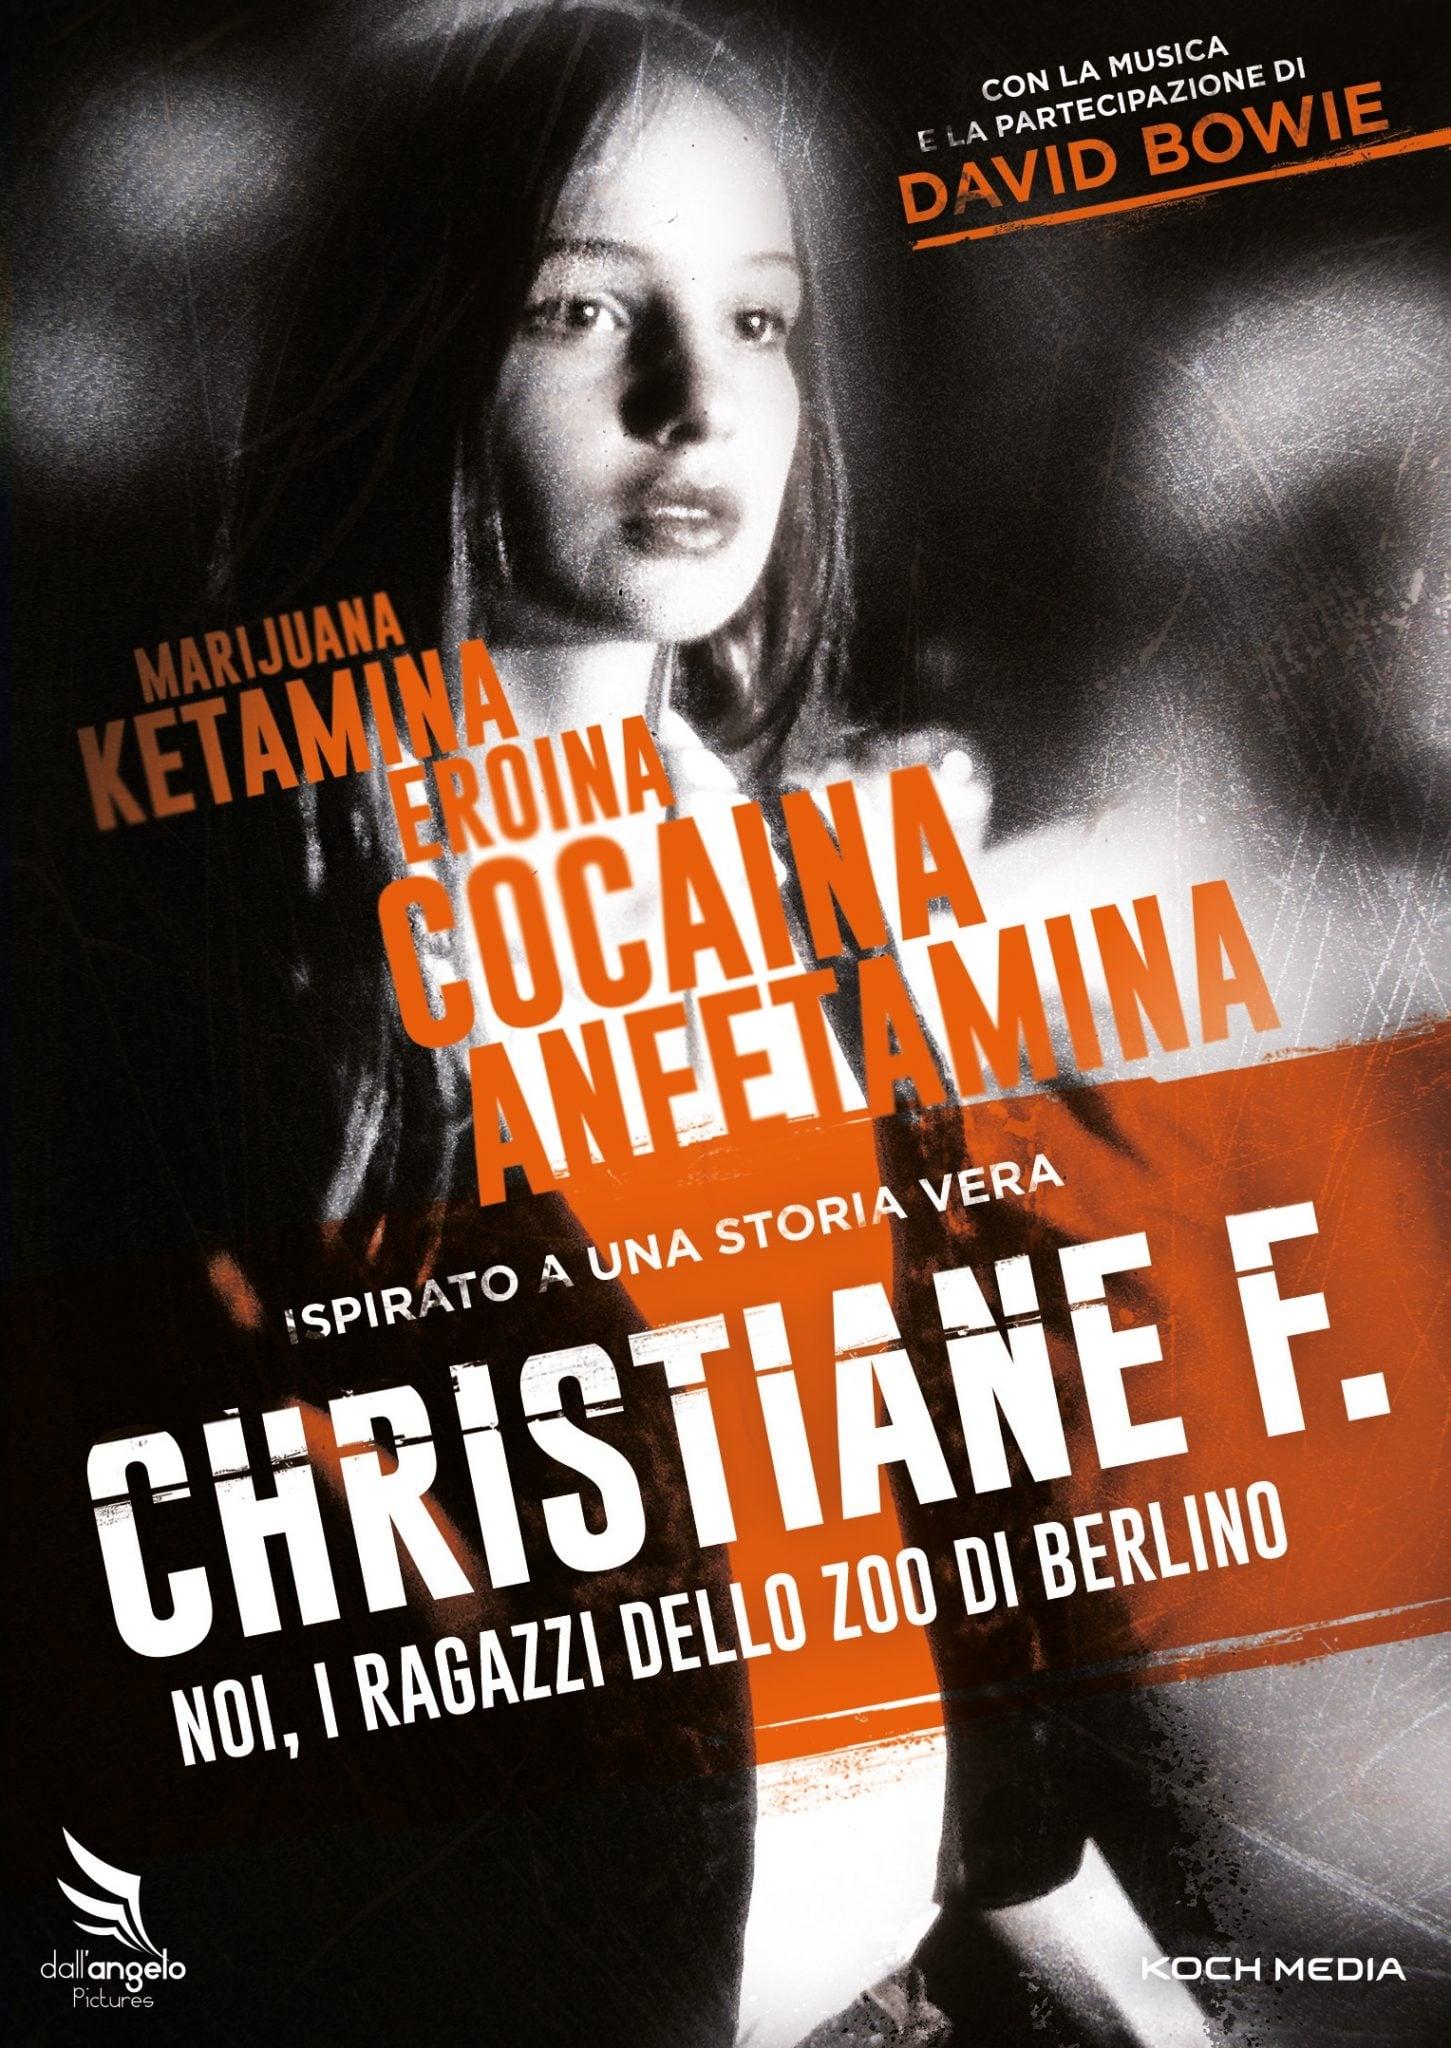 Christiane F Stream